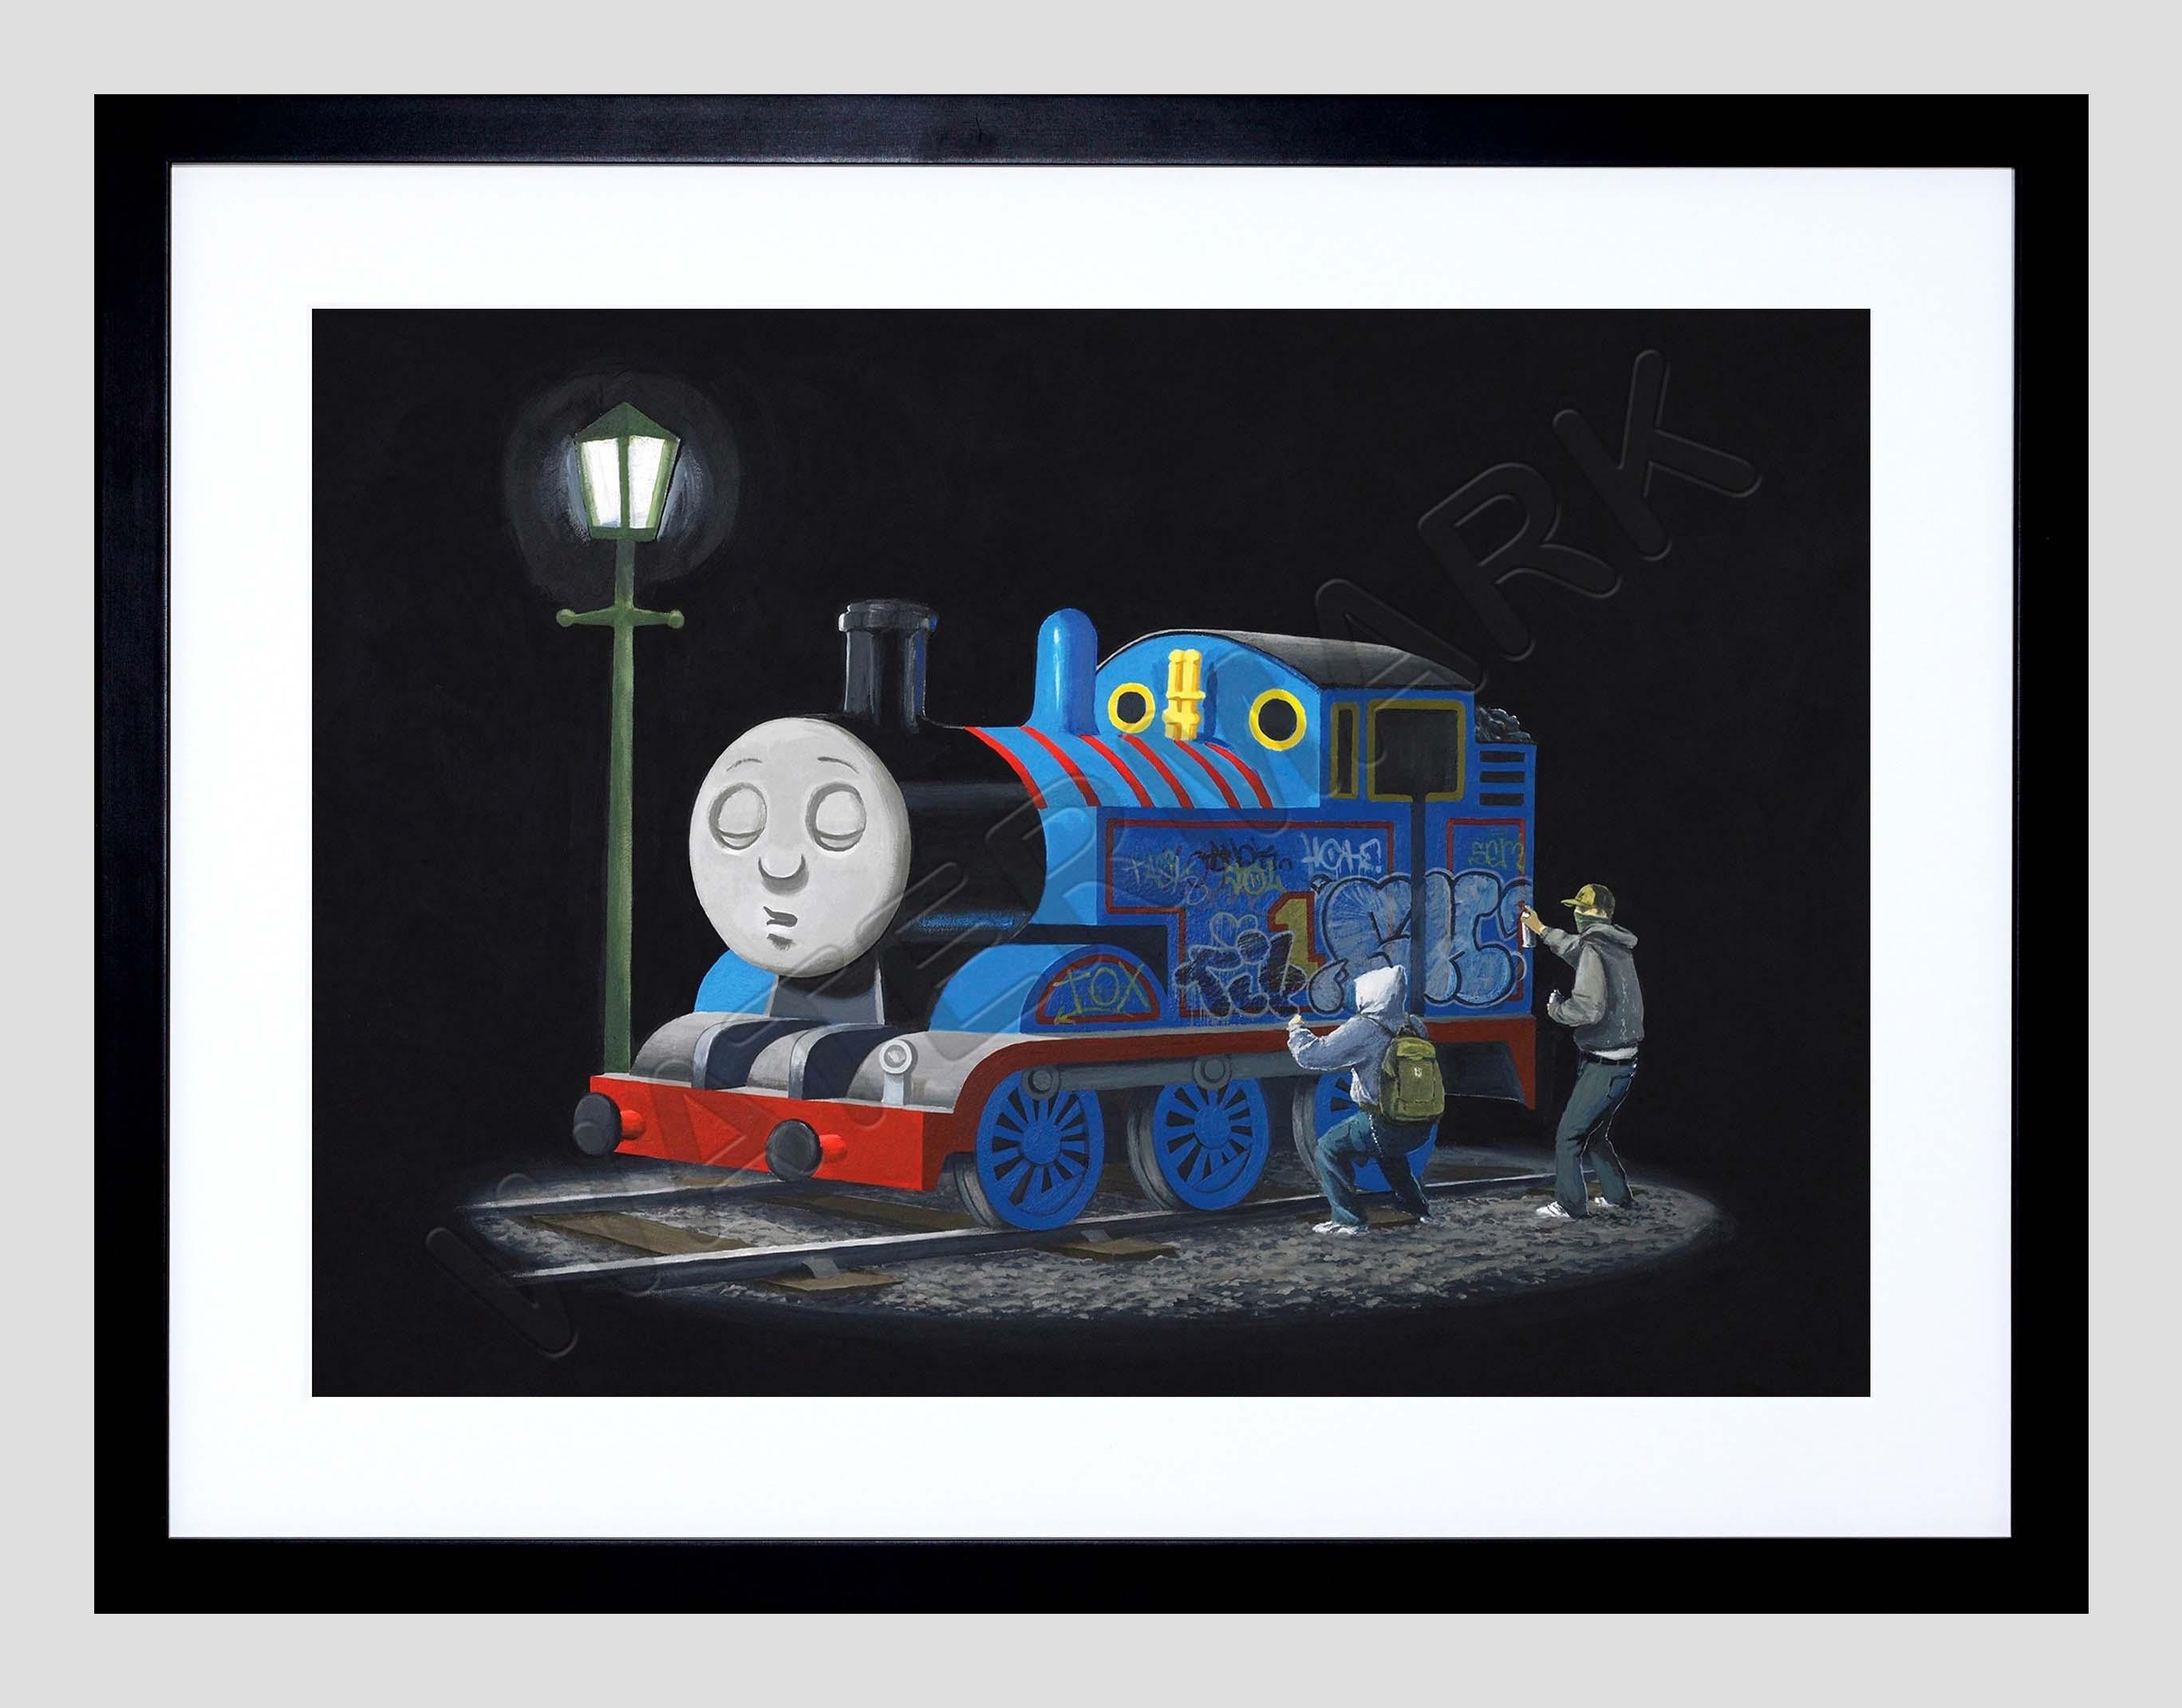 Banksy Thomas Tank Engine Graffiti Street Art 12x16'' Framed Art Regarding Current European Framed Art Prints (View 15 of 15)